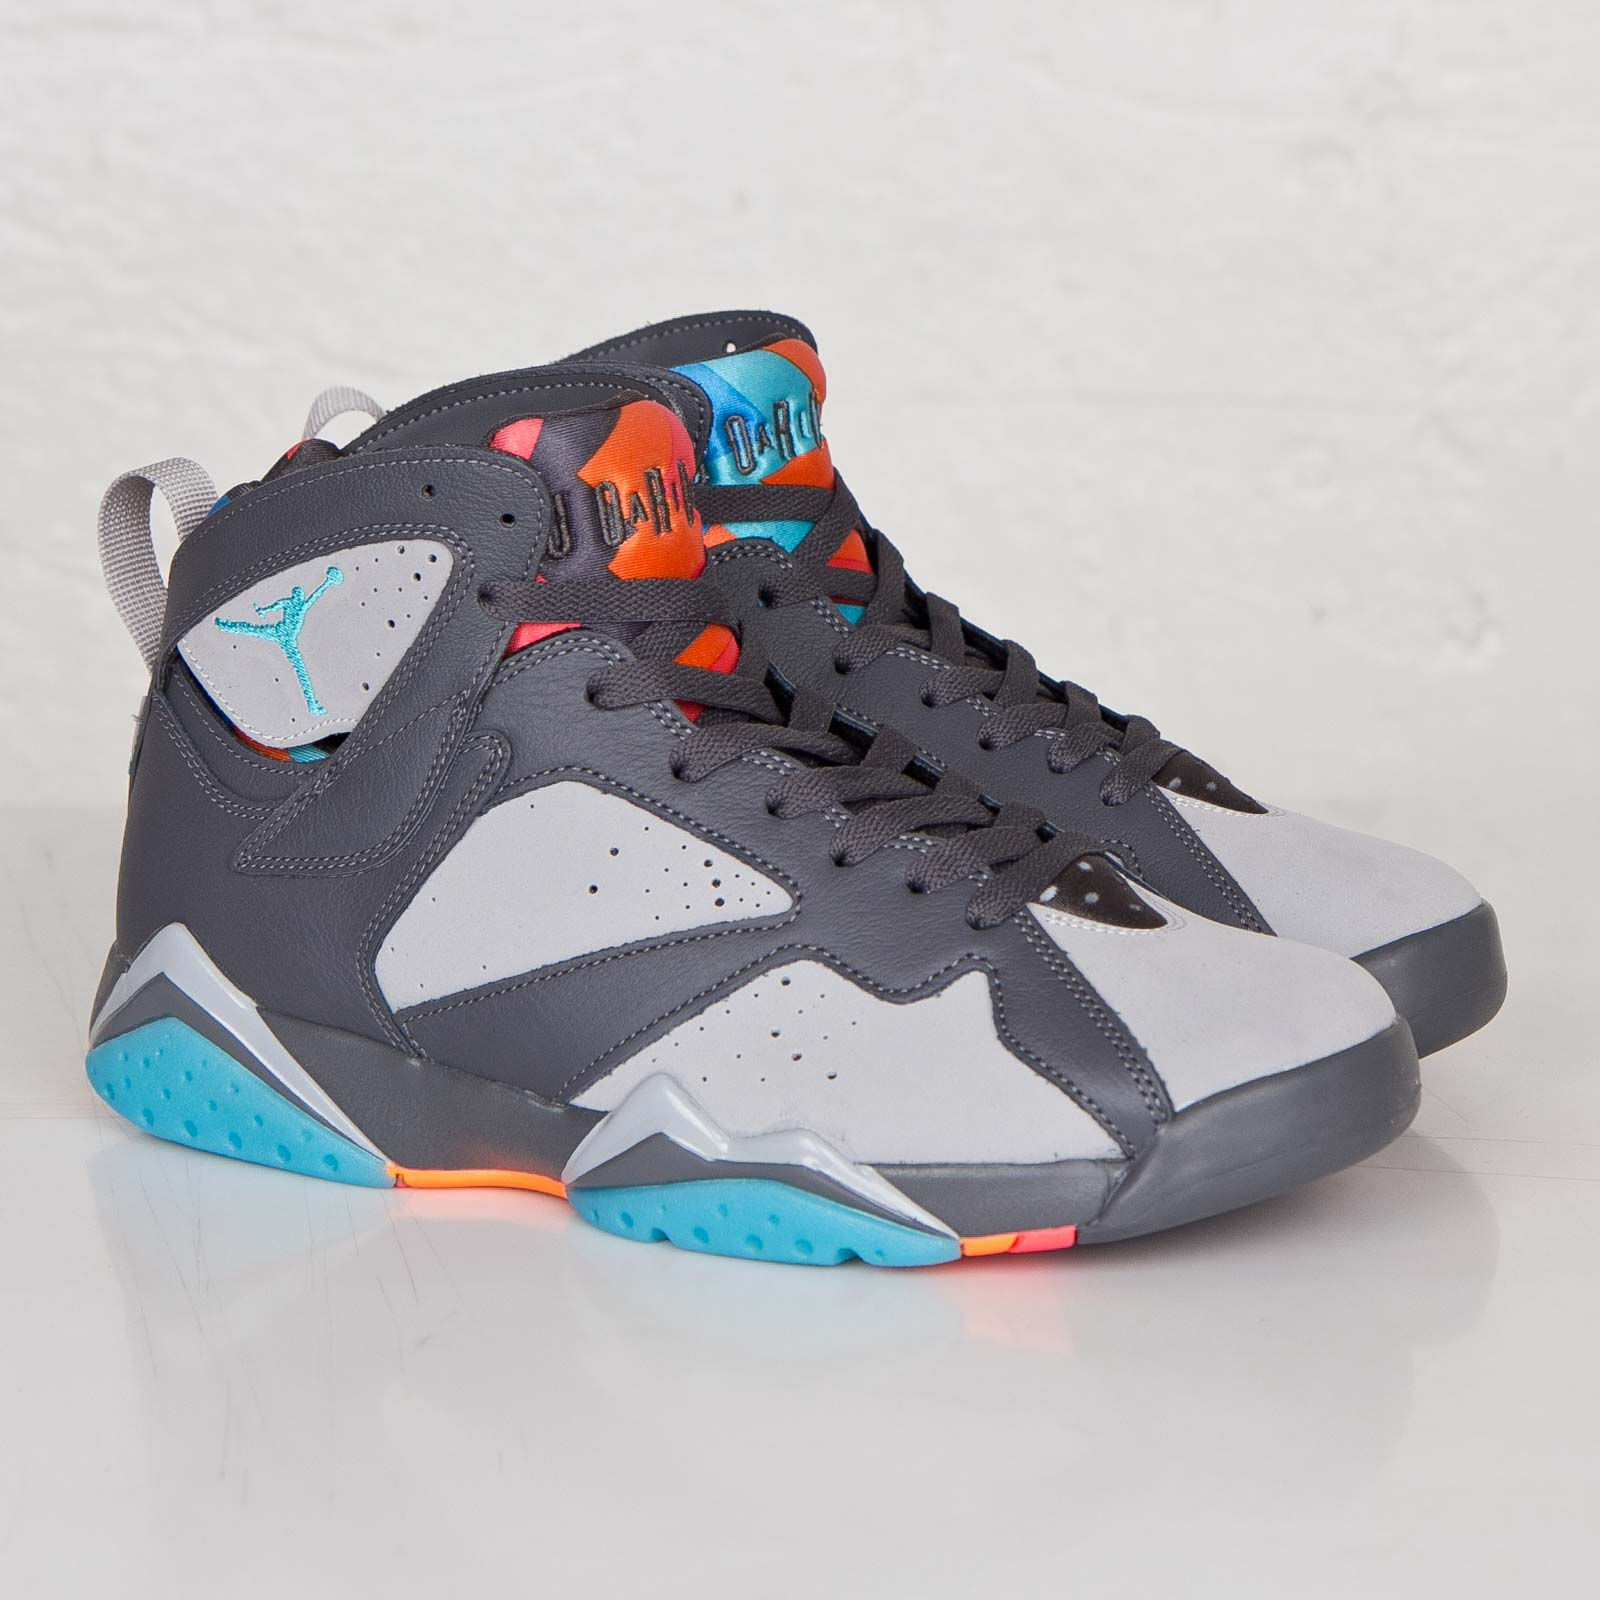 1f950b24be8 Jordan Brand Air Jordan 7 Retro - 304775-016 - Sneakersnstuff ...